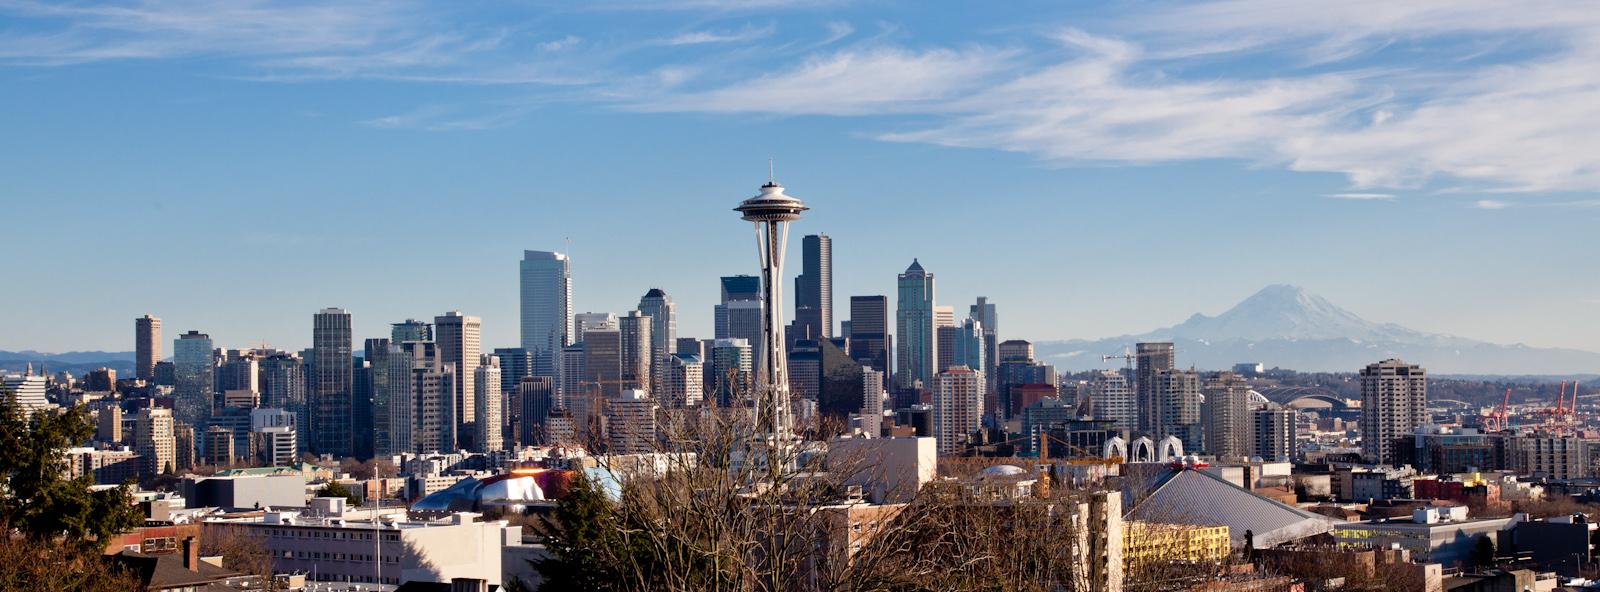 Seattle Skyline. Photograph by Kenneth Lu